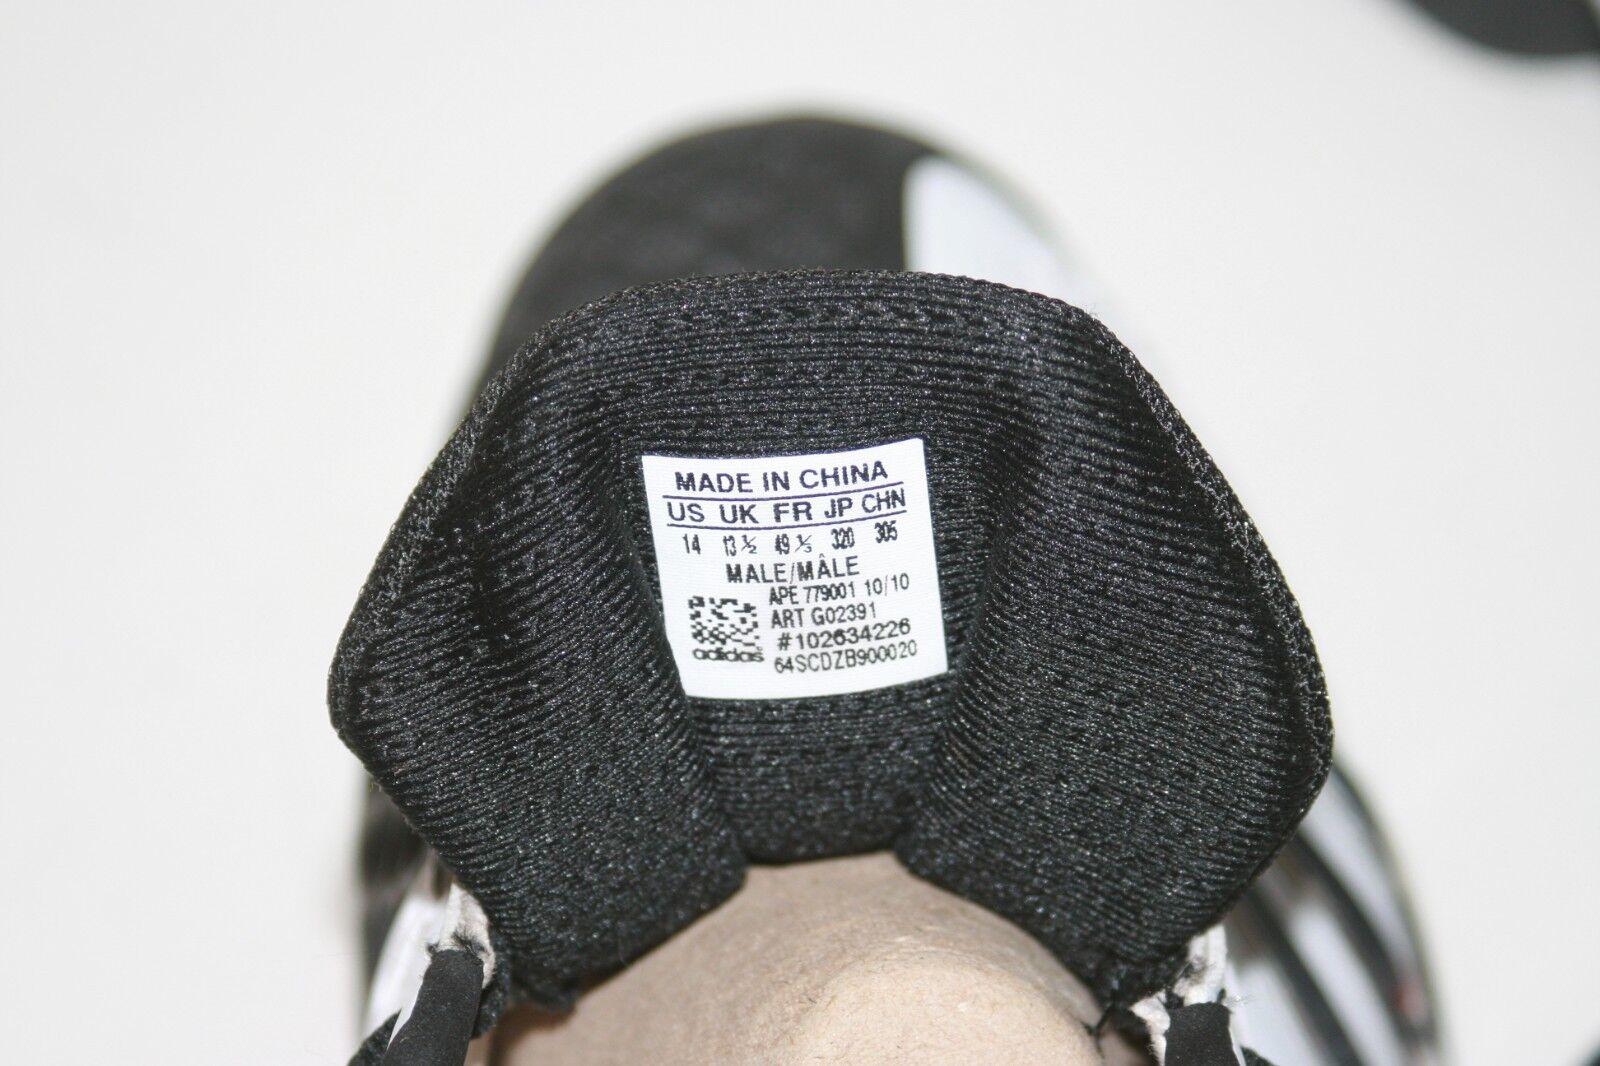 Adidas torsion system schwarz - weiß - silber nwob bei sz - 14 nwob silber 7e23ce